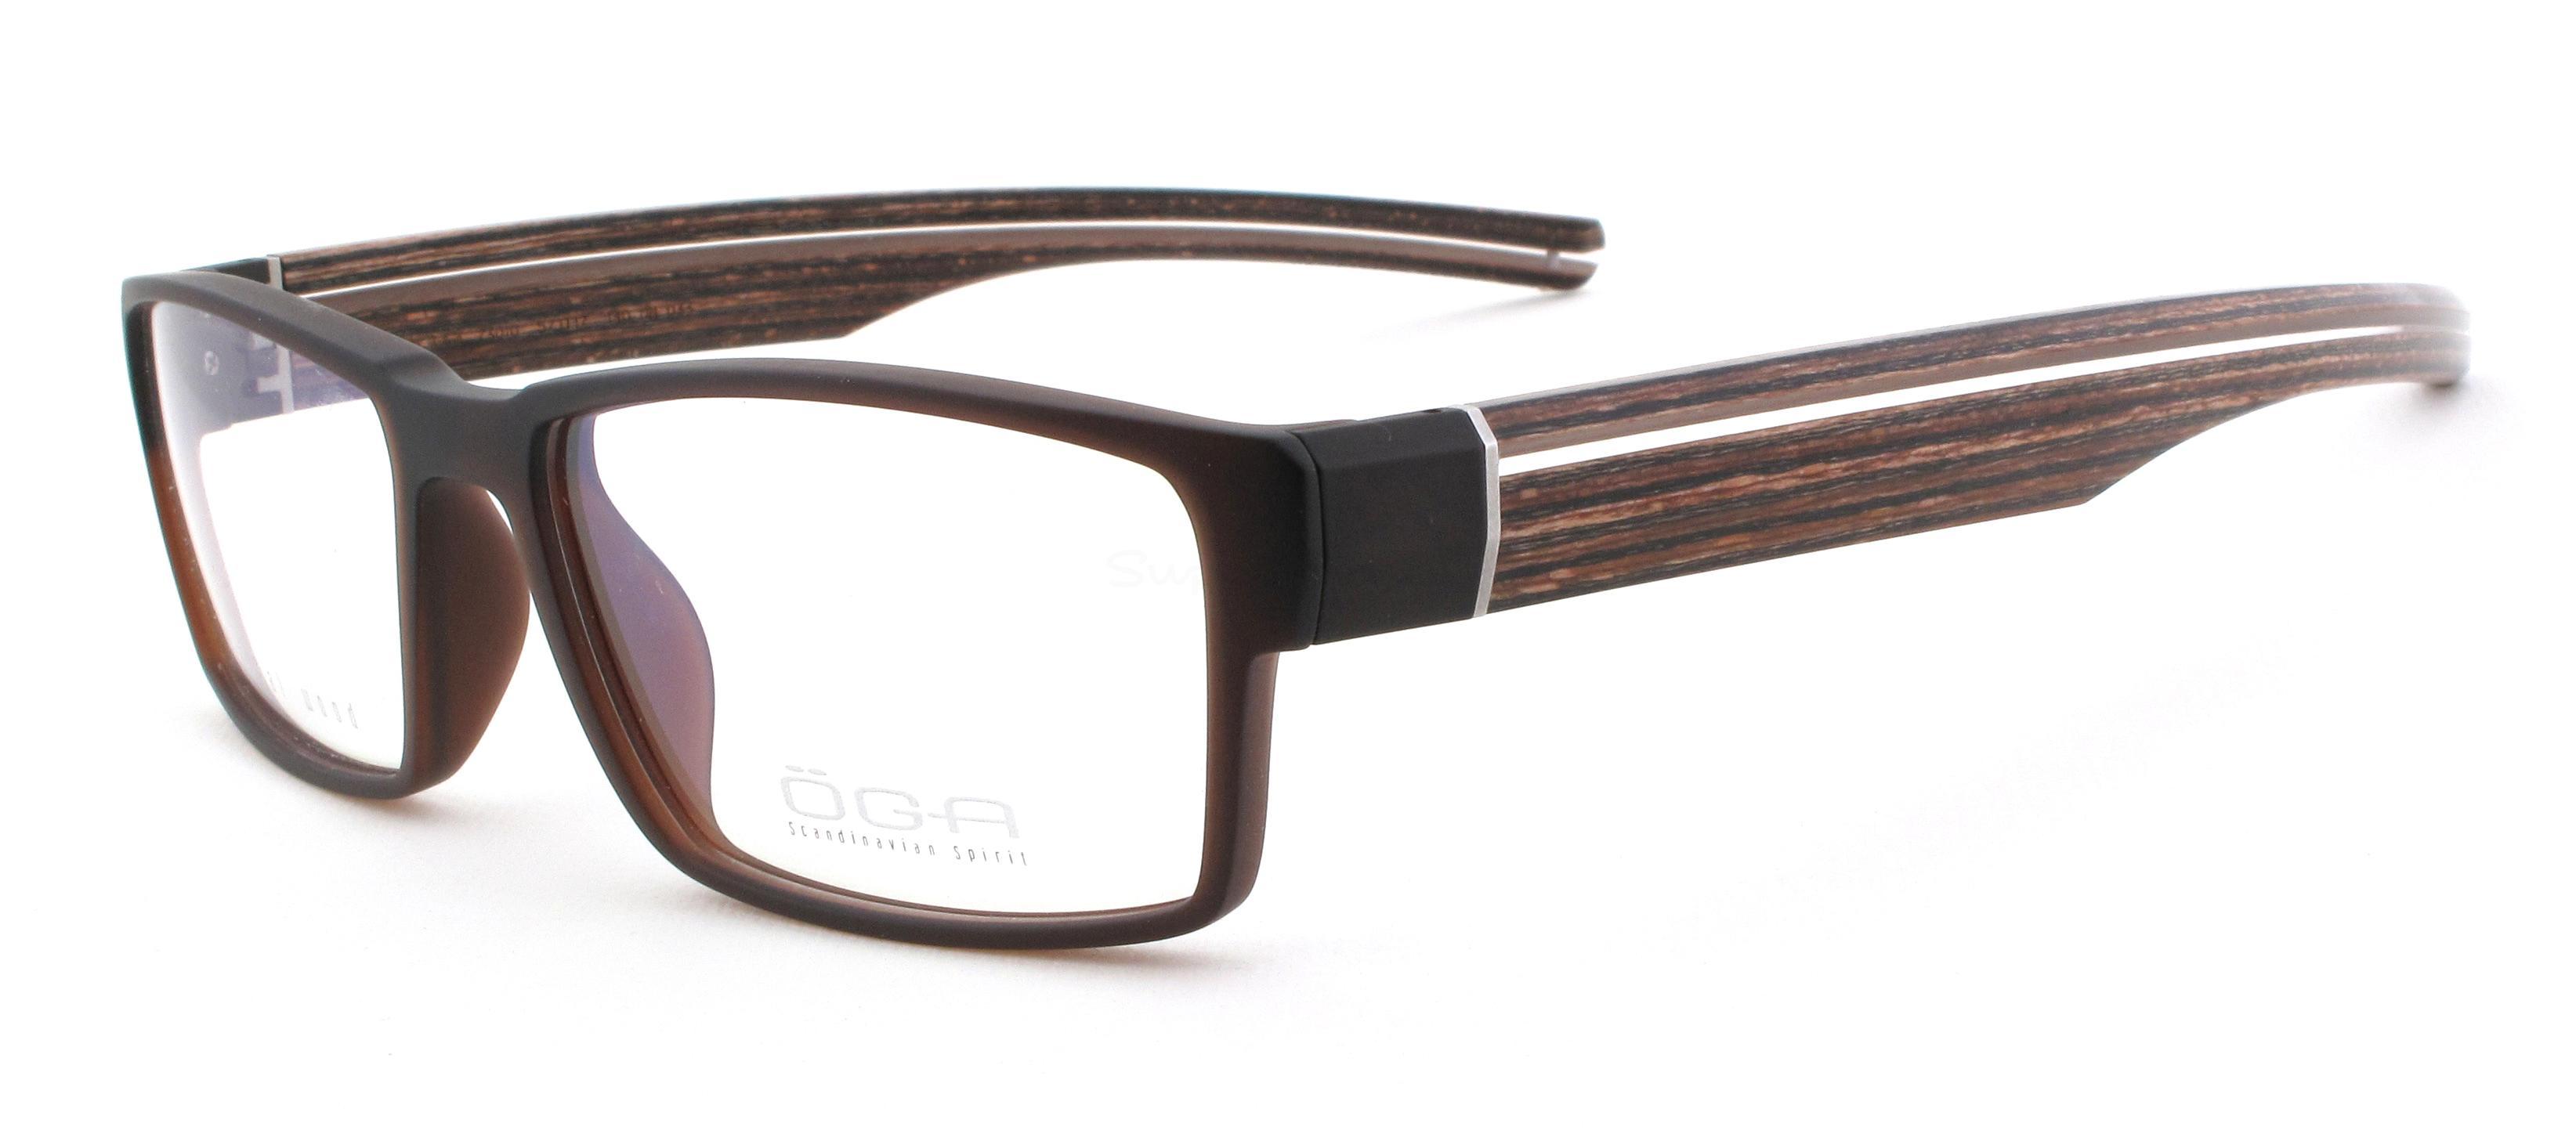 MM033 7301O GLASTRA Glasses, ÖGA Scandinavian Spirit